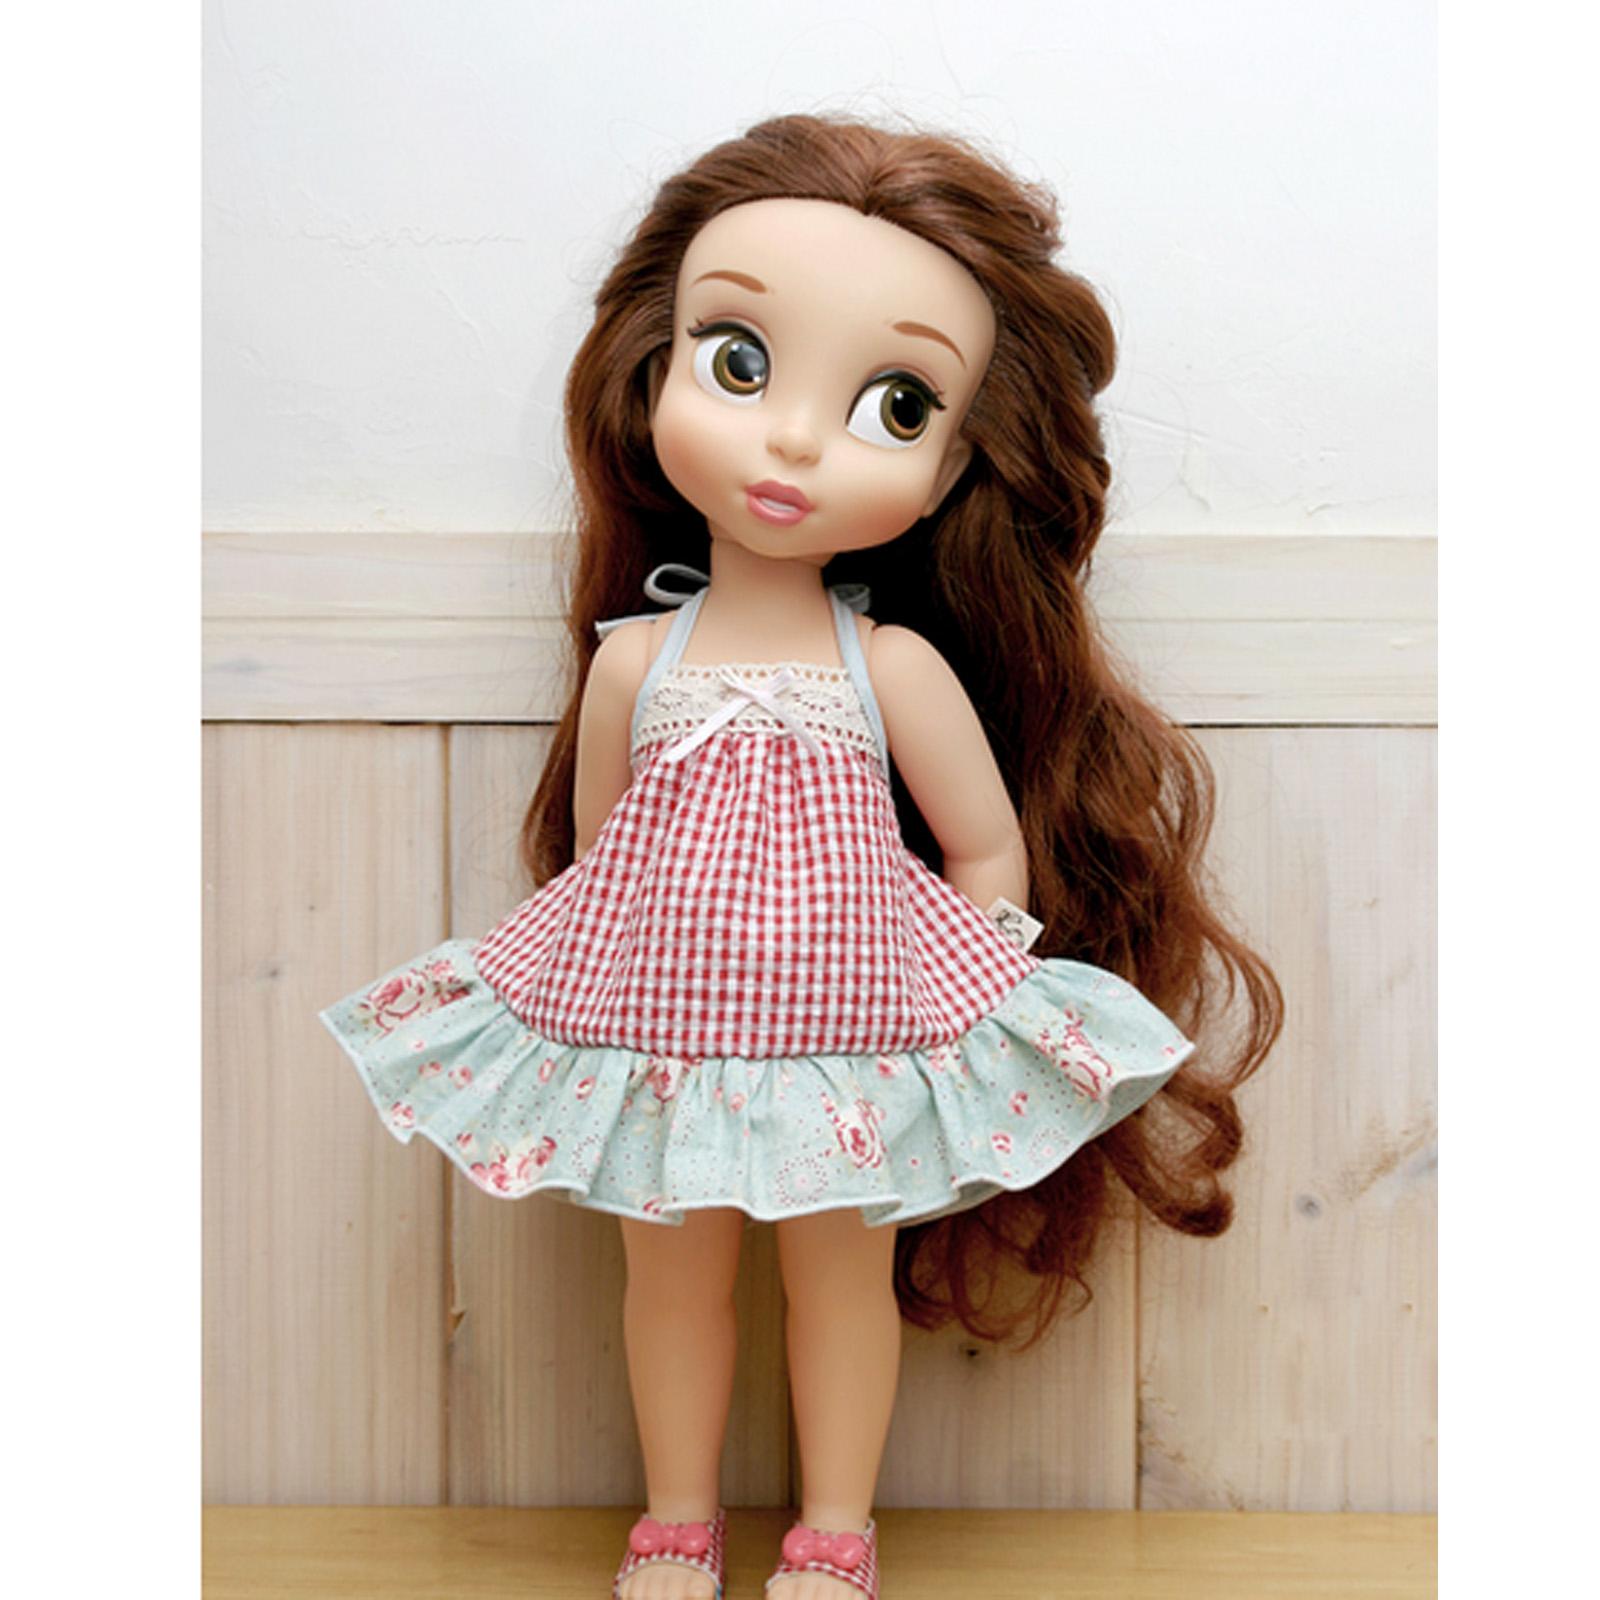 Disney Princess Doll Clothes: Disney Baby Doll Clothes Dress Clothing Halter Neck